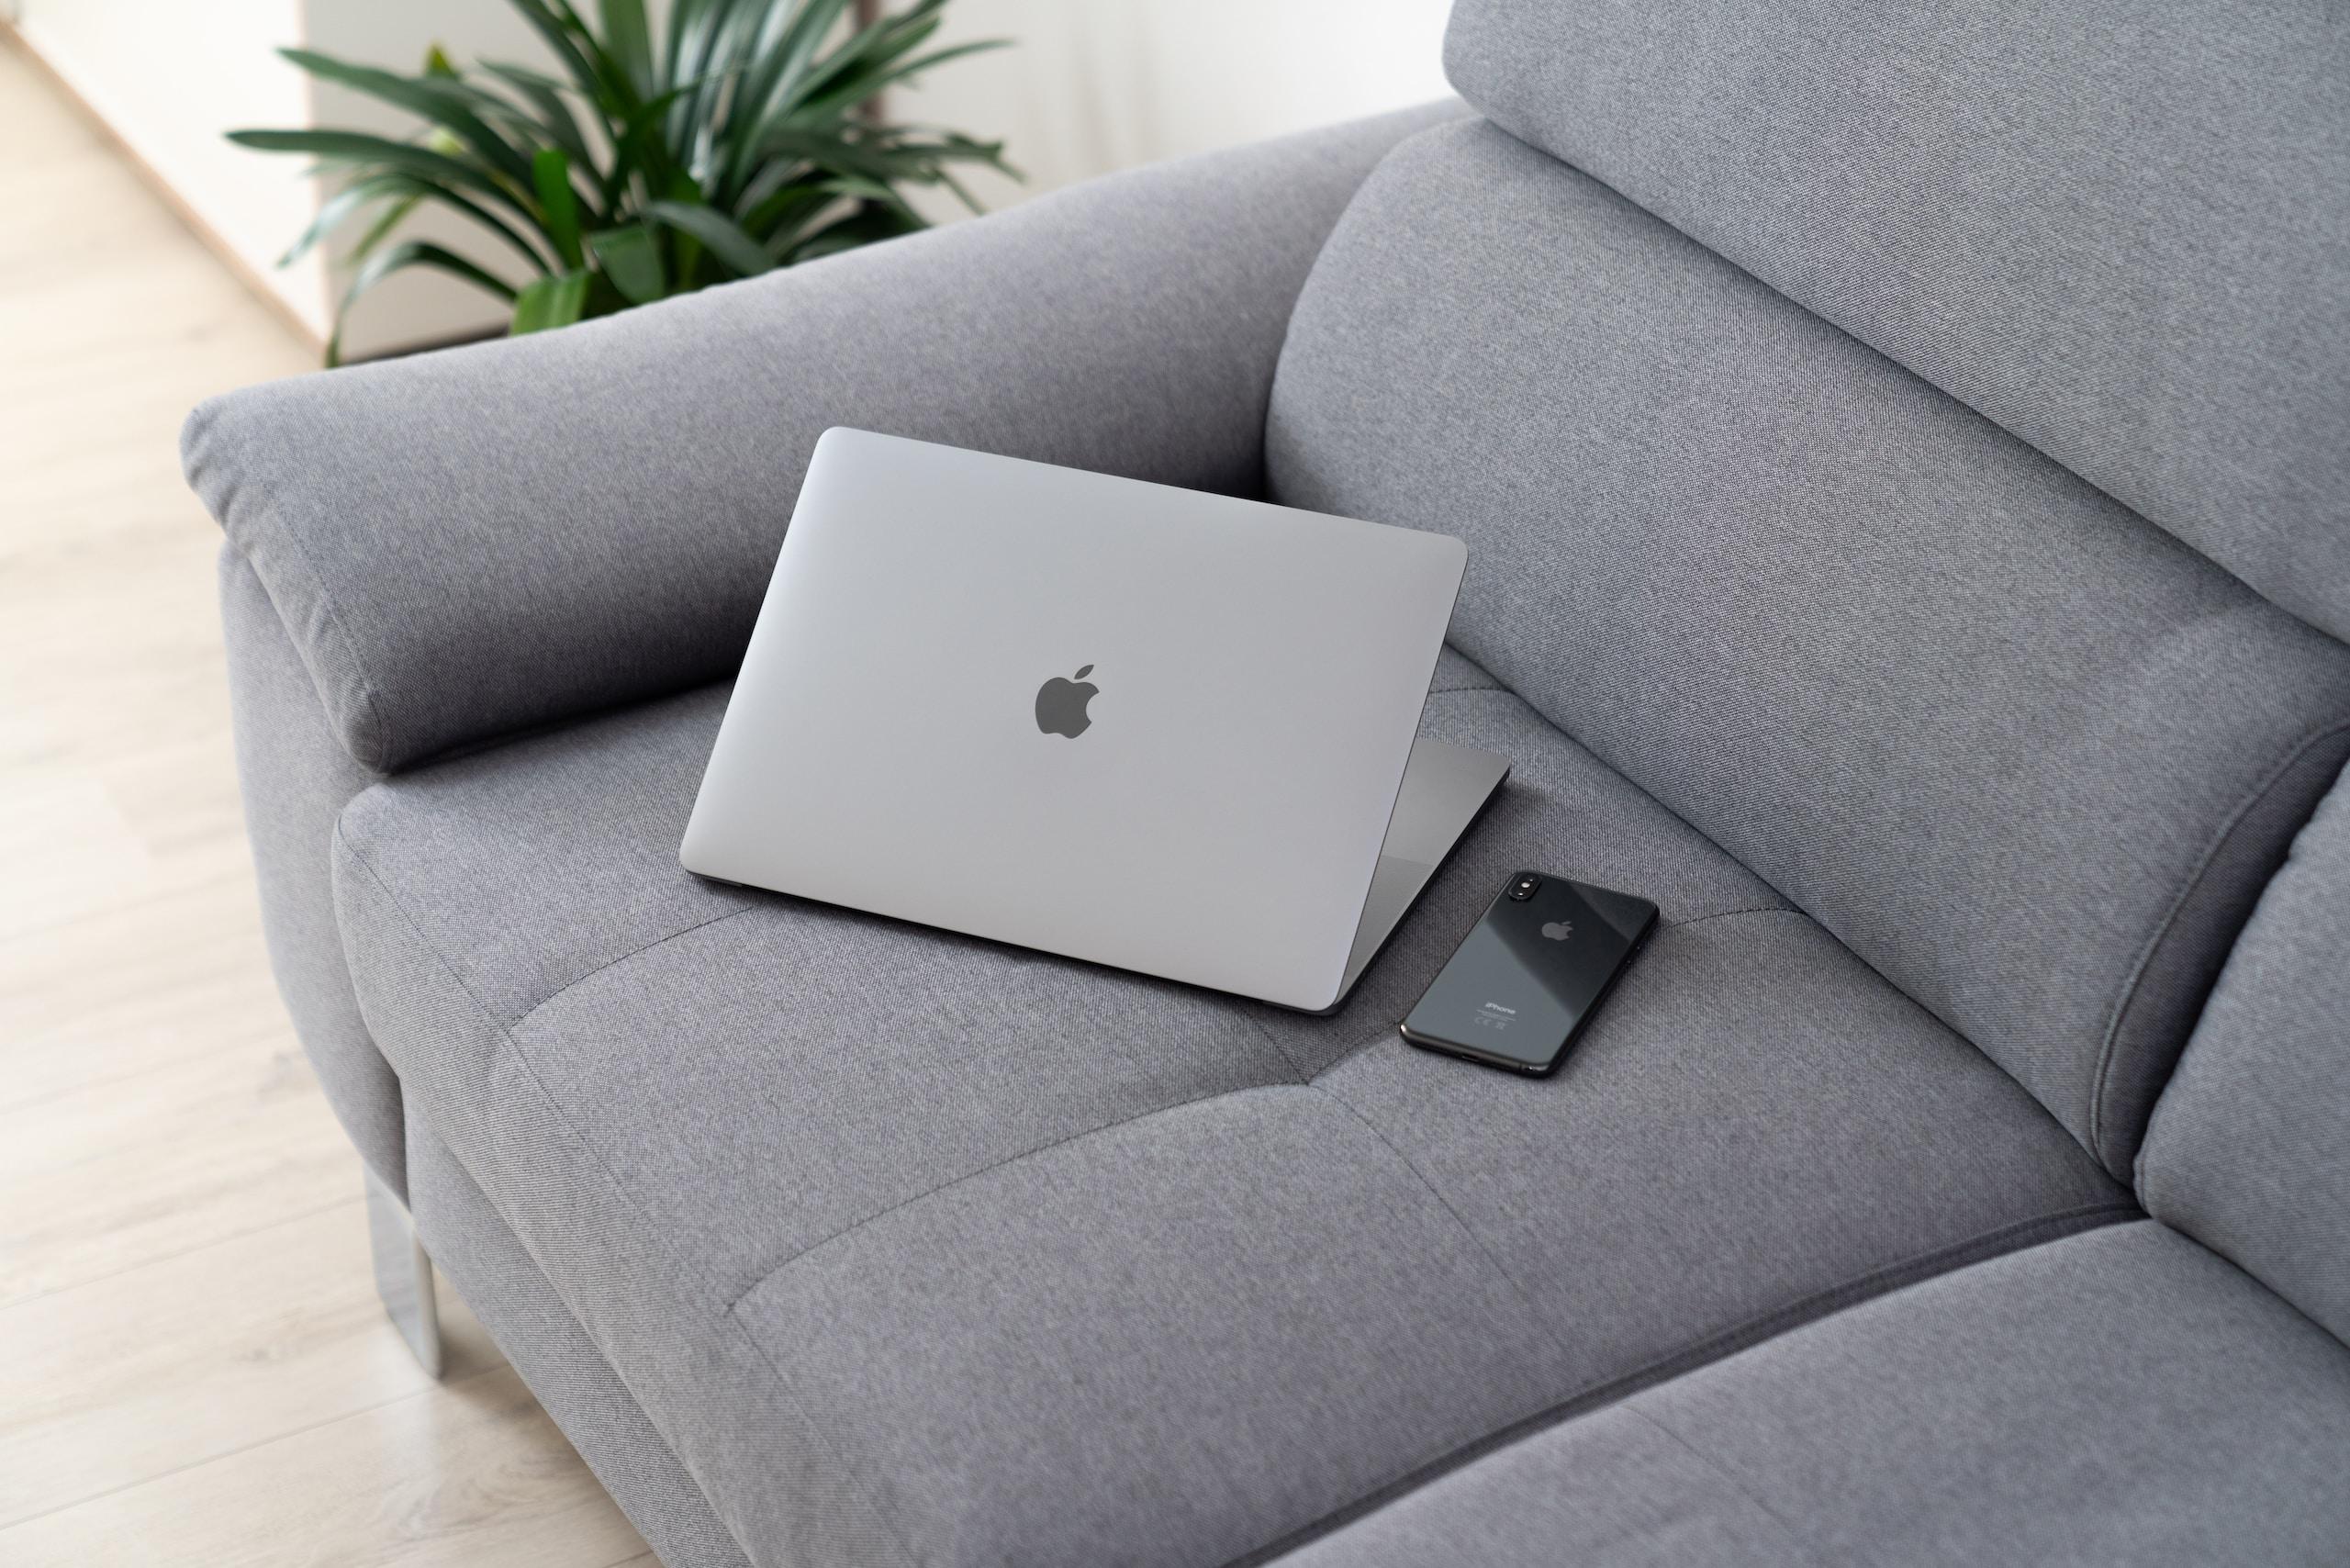 MacBook on grey sofa